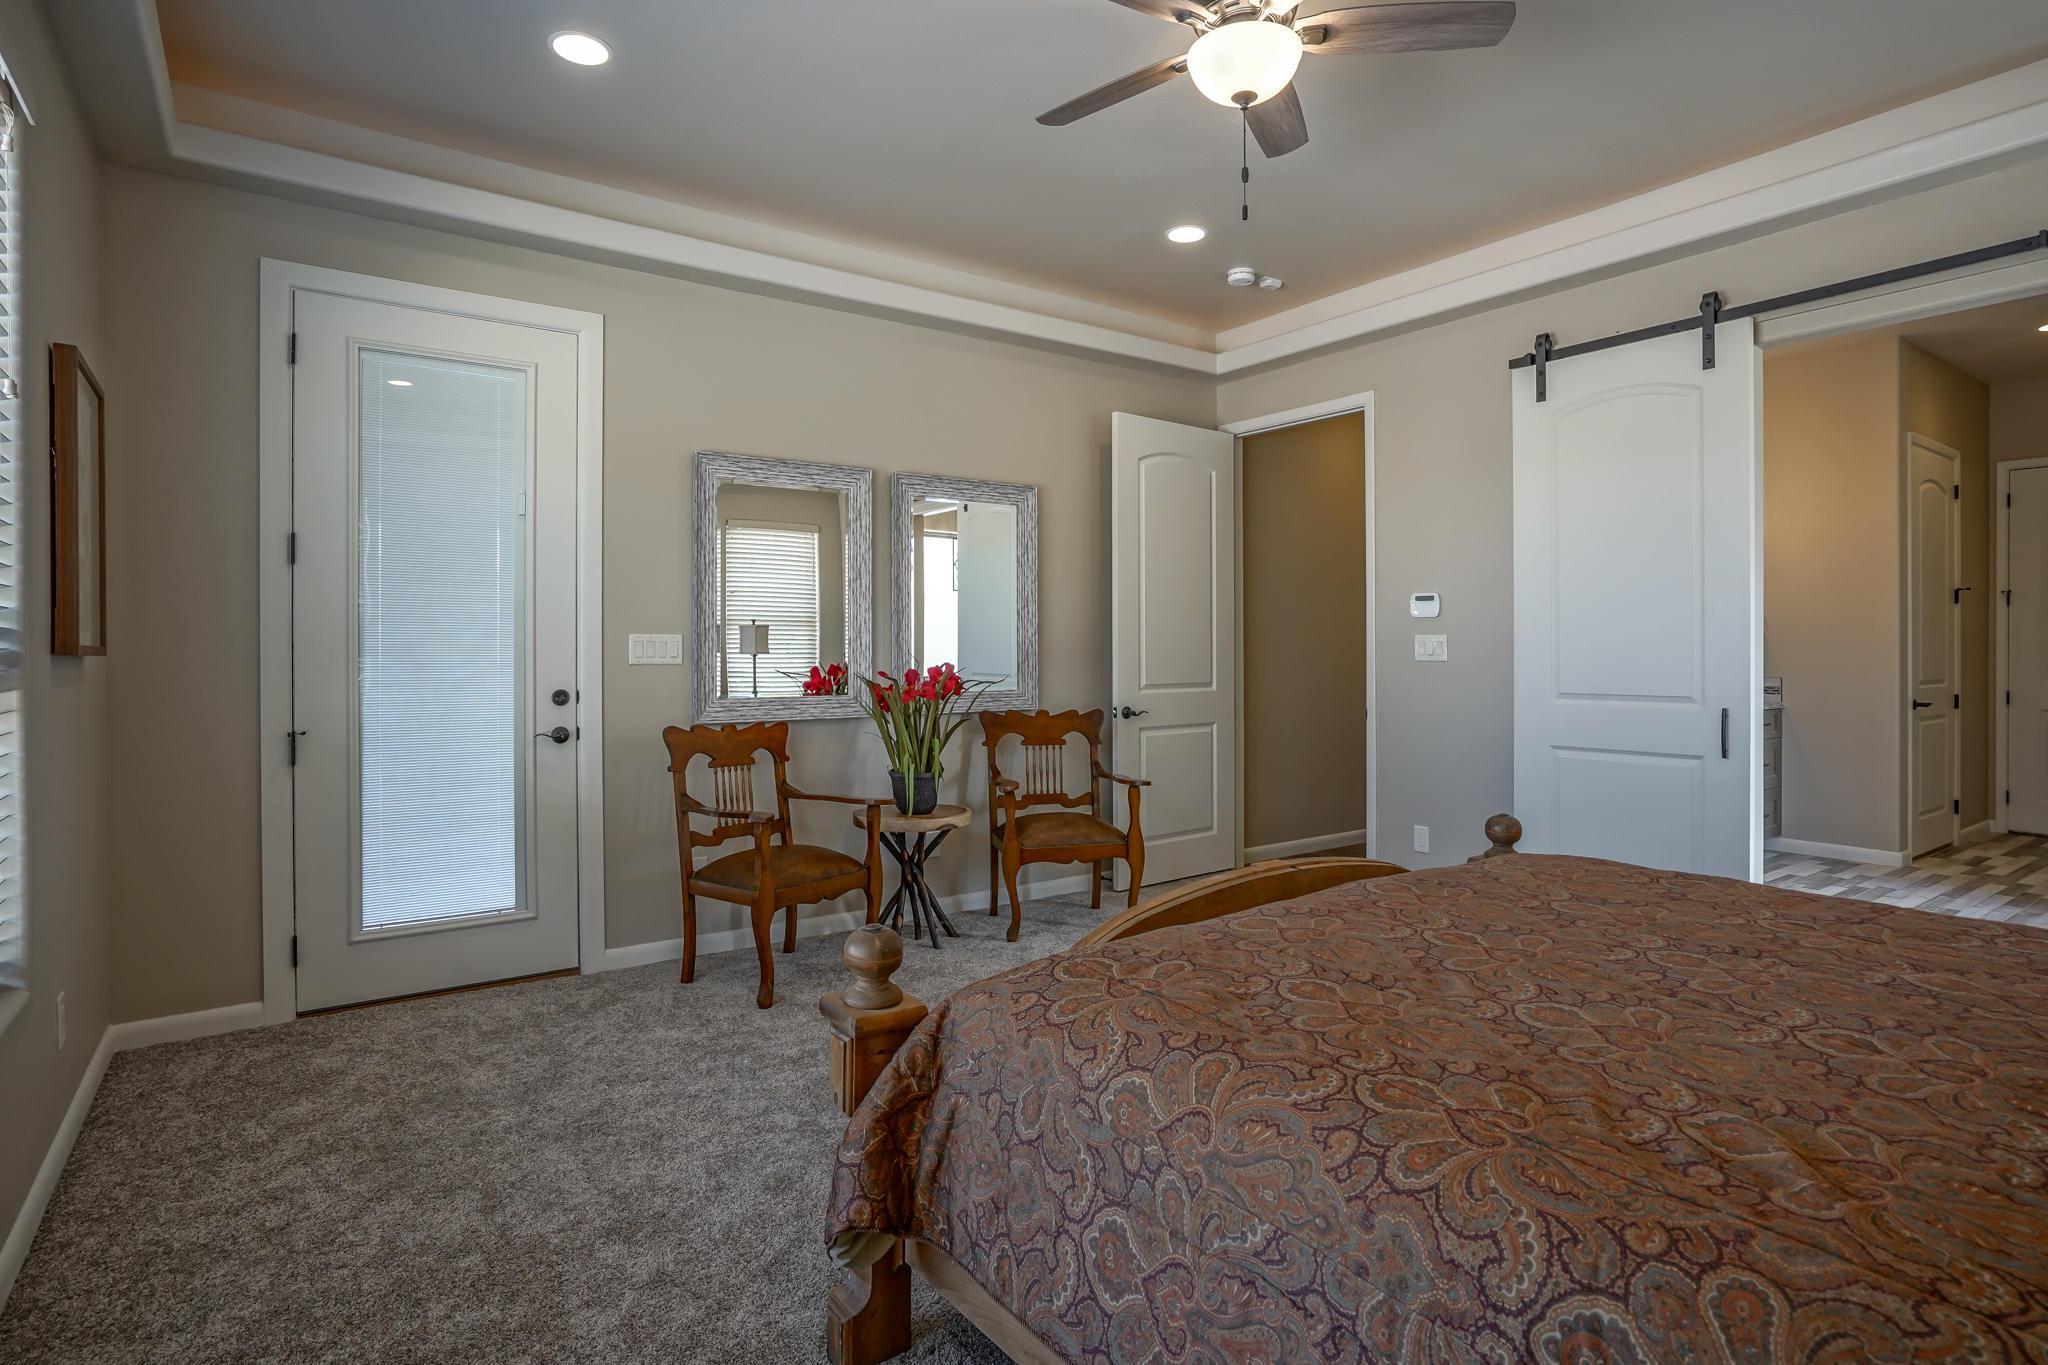 Master Bedroom with Spa-Like Bath